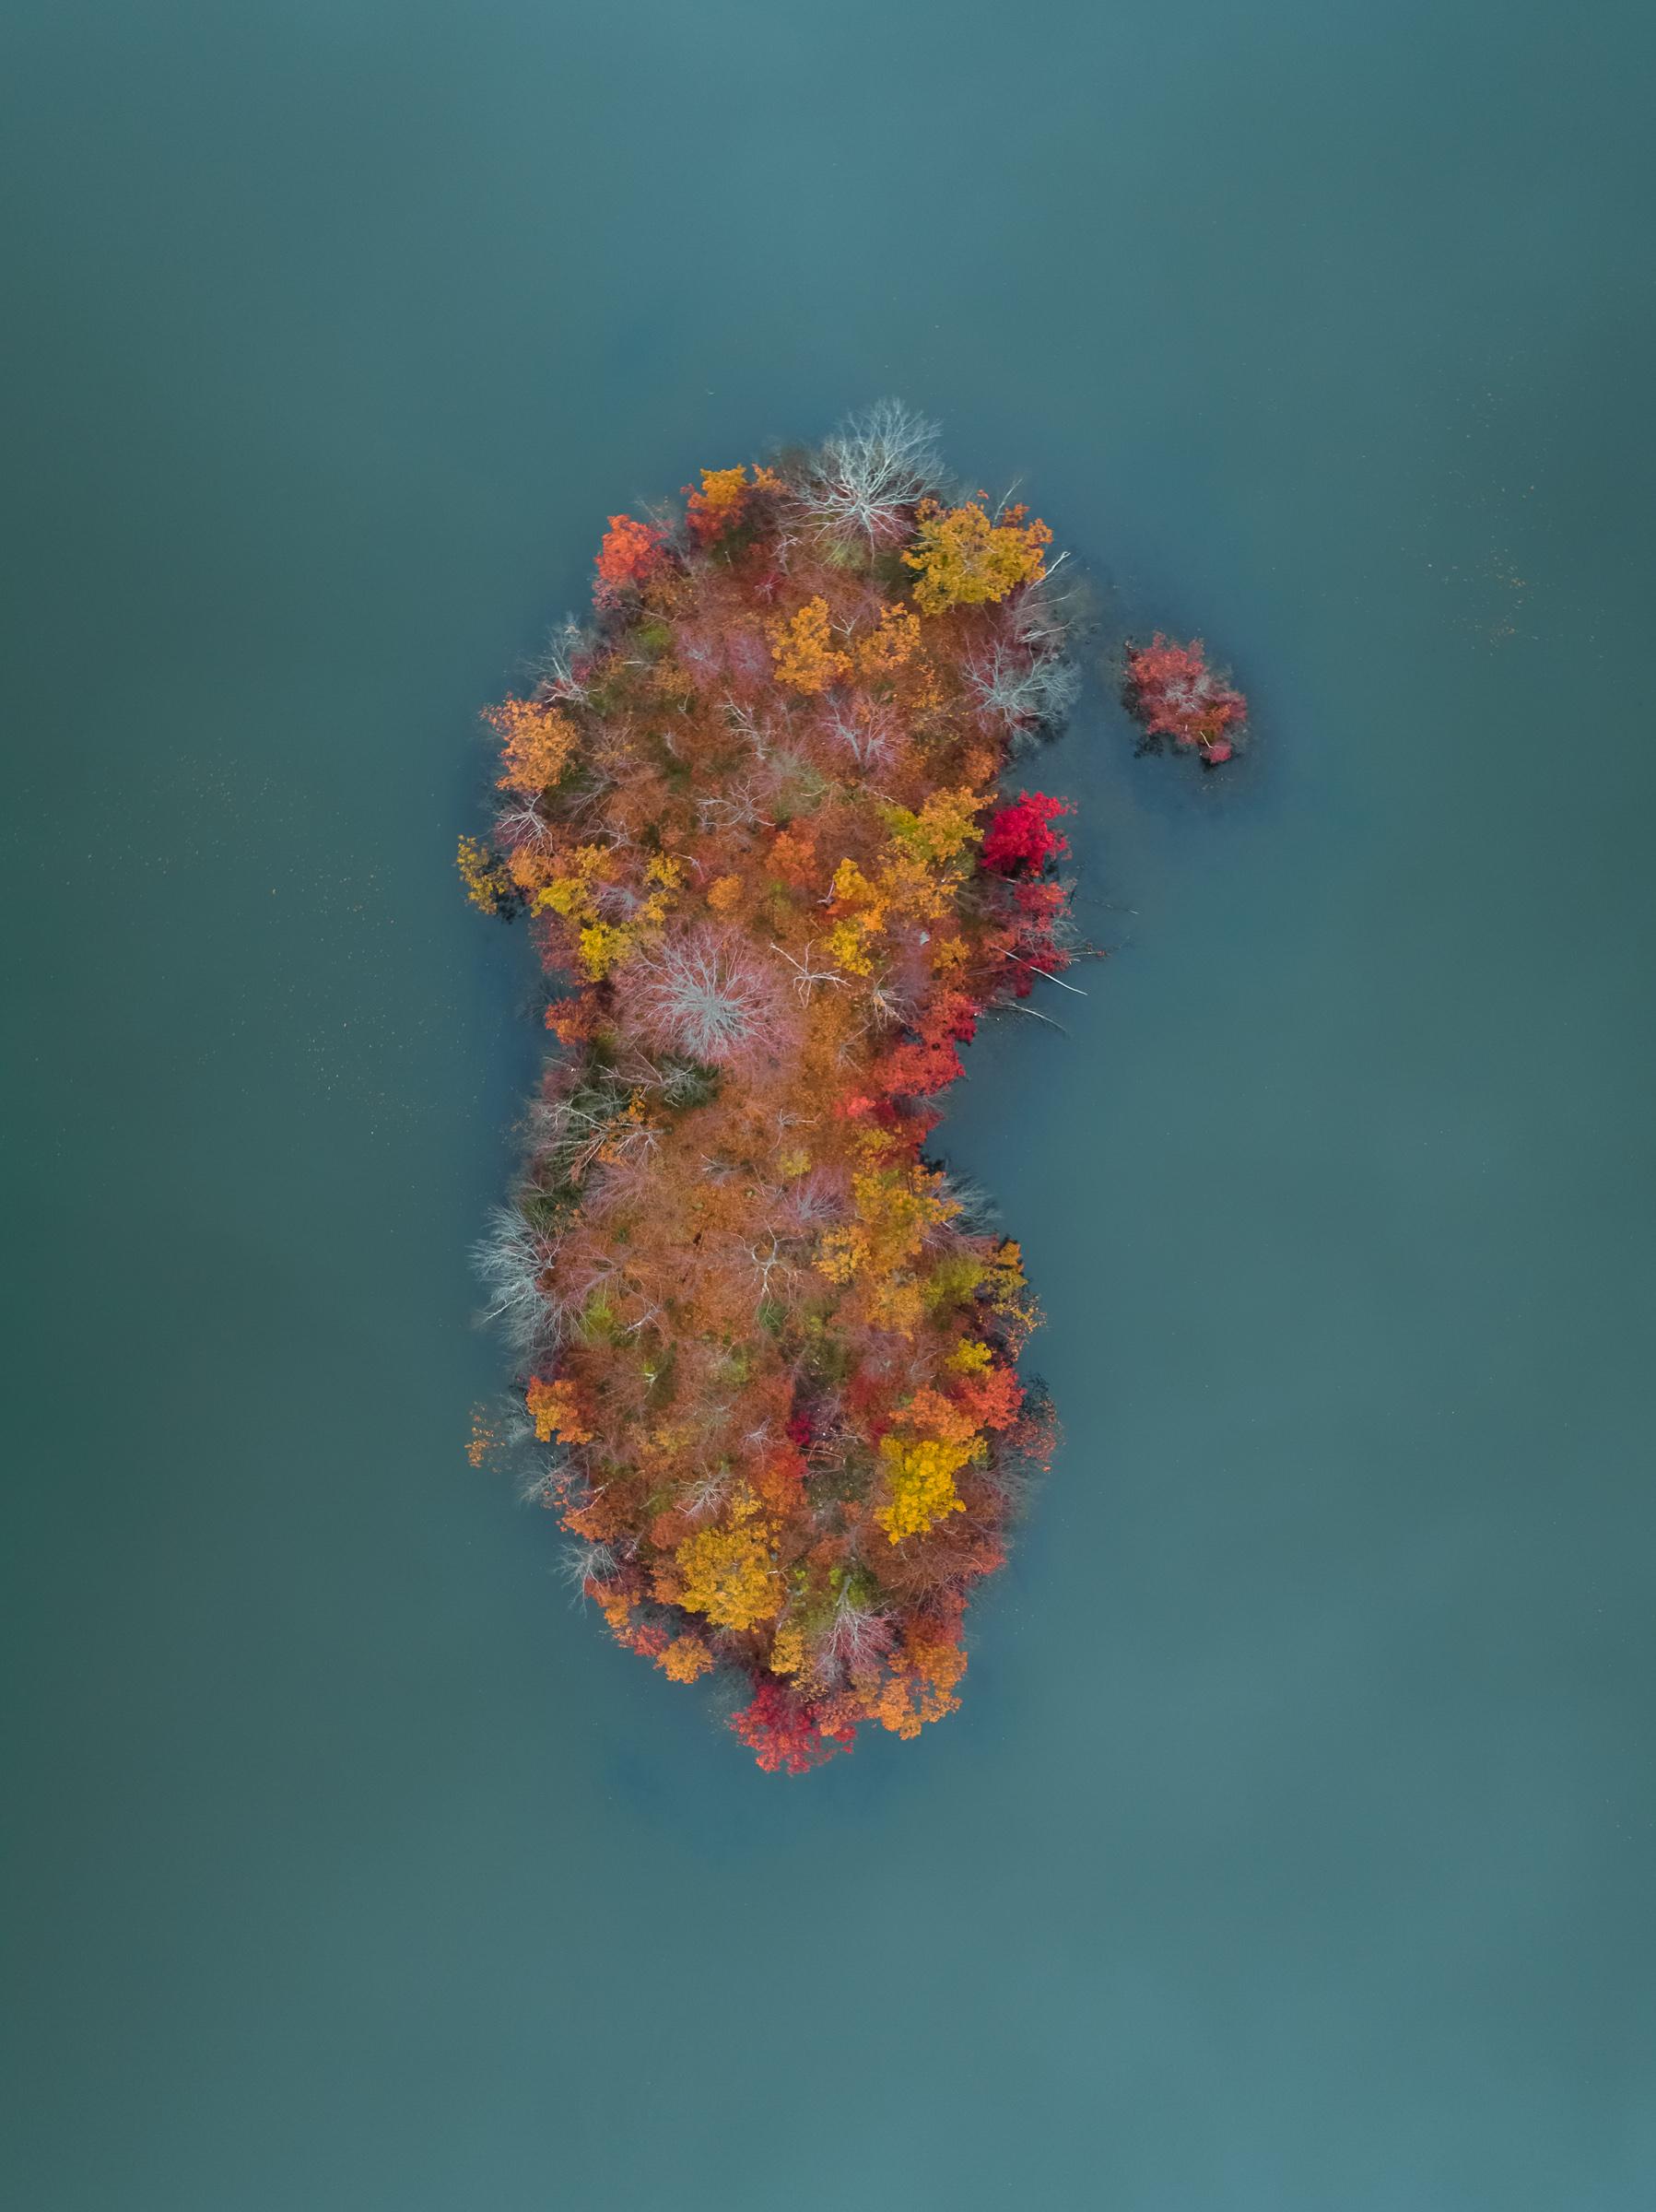 colorisland_typoland_aerial.jpg